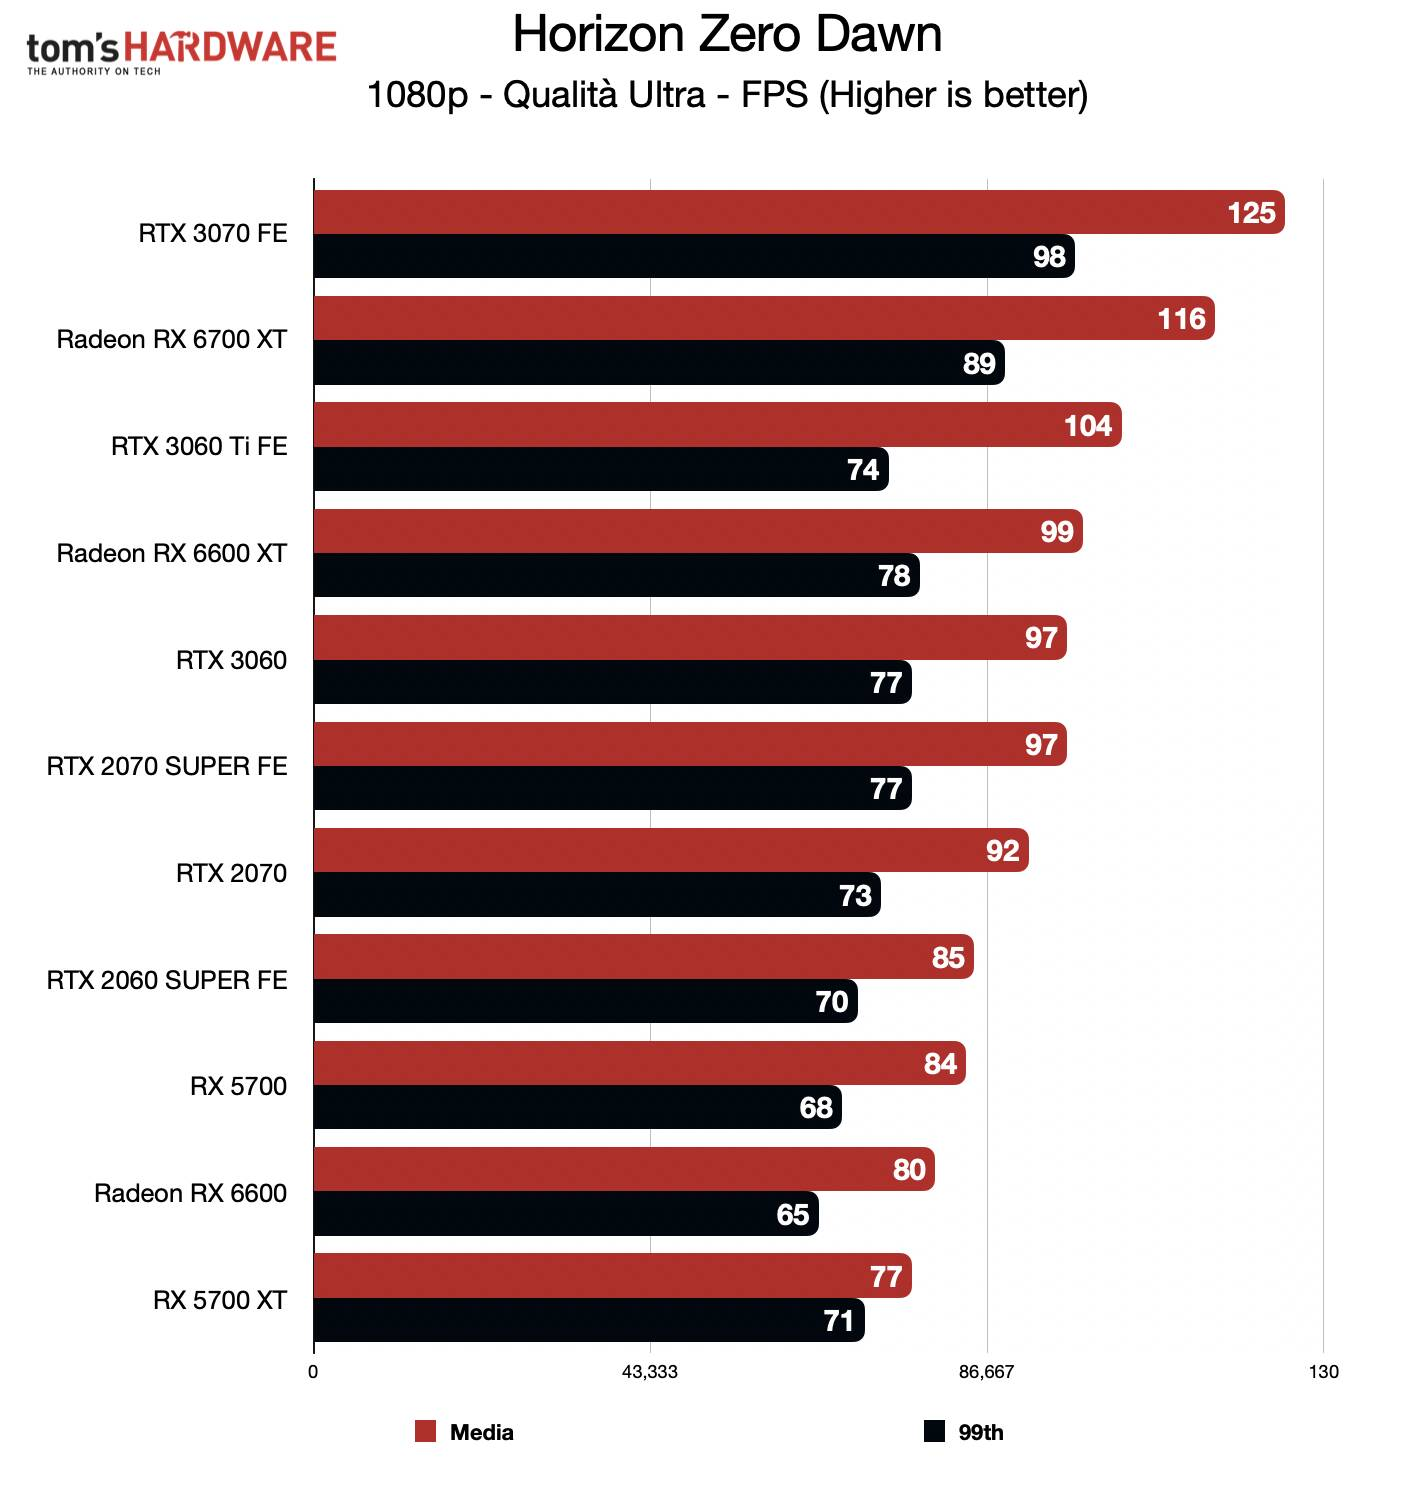 Benchmark Radeon RX 6600 - FHD - Horizon Zero Dawn